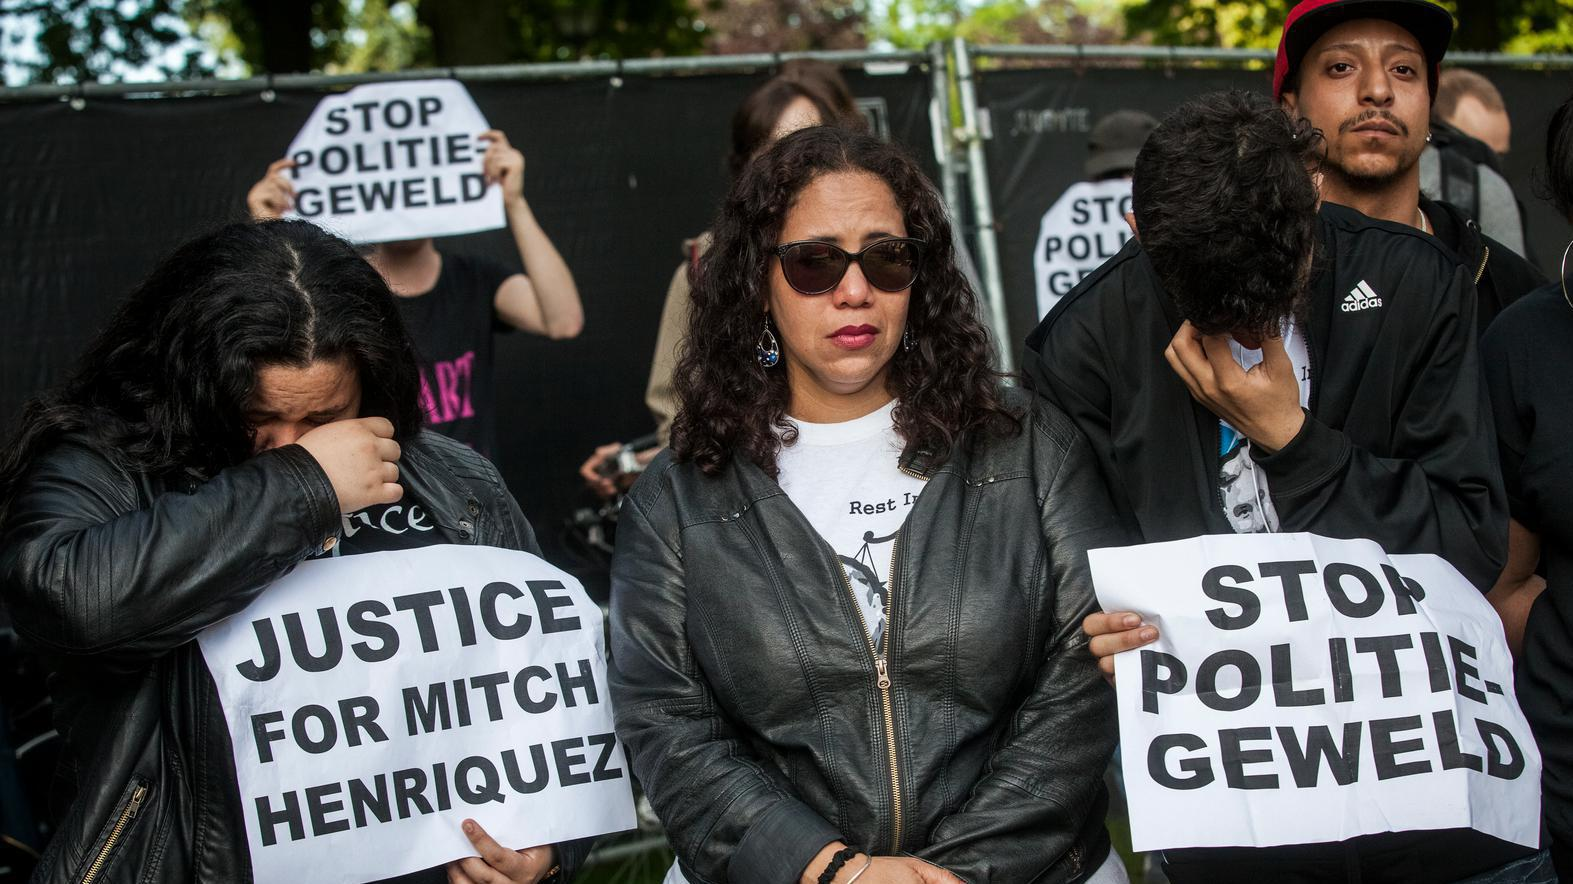 AD | Familie Mitch Henriquez eist opheldering over inspectierapport